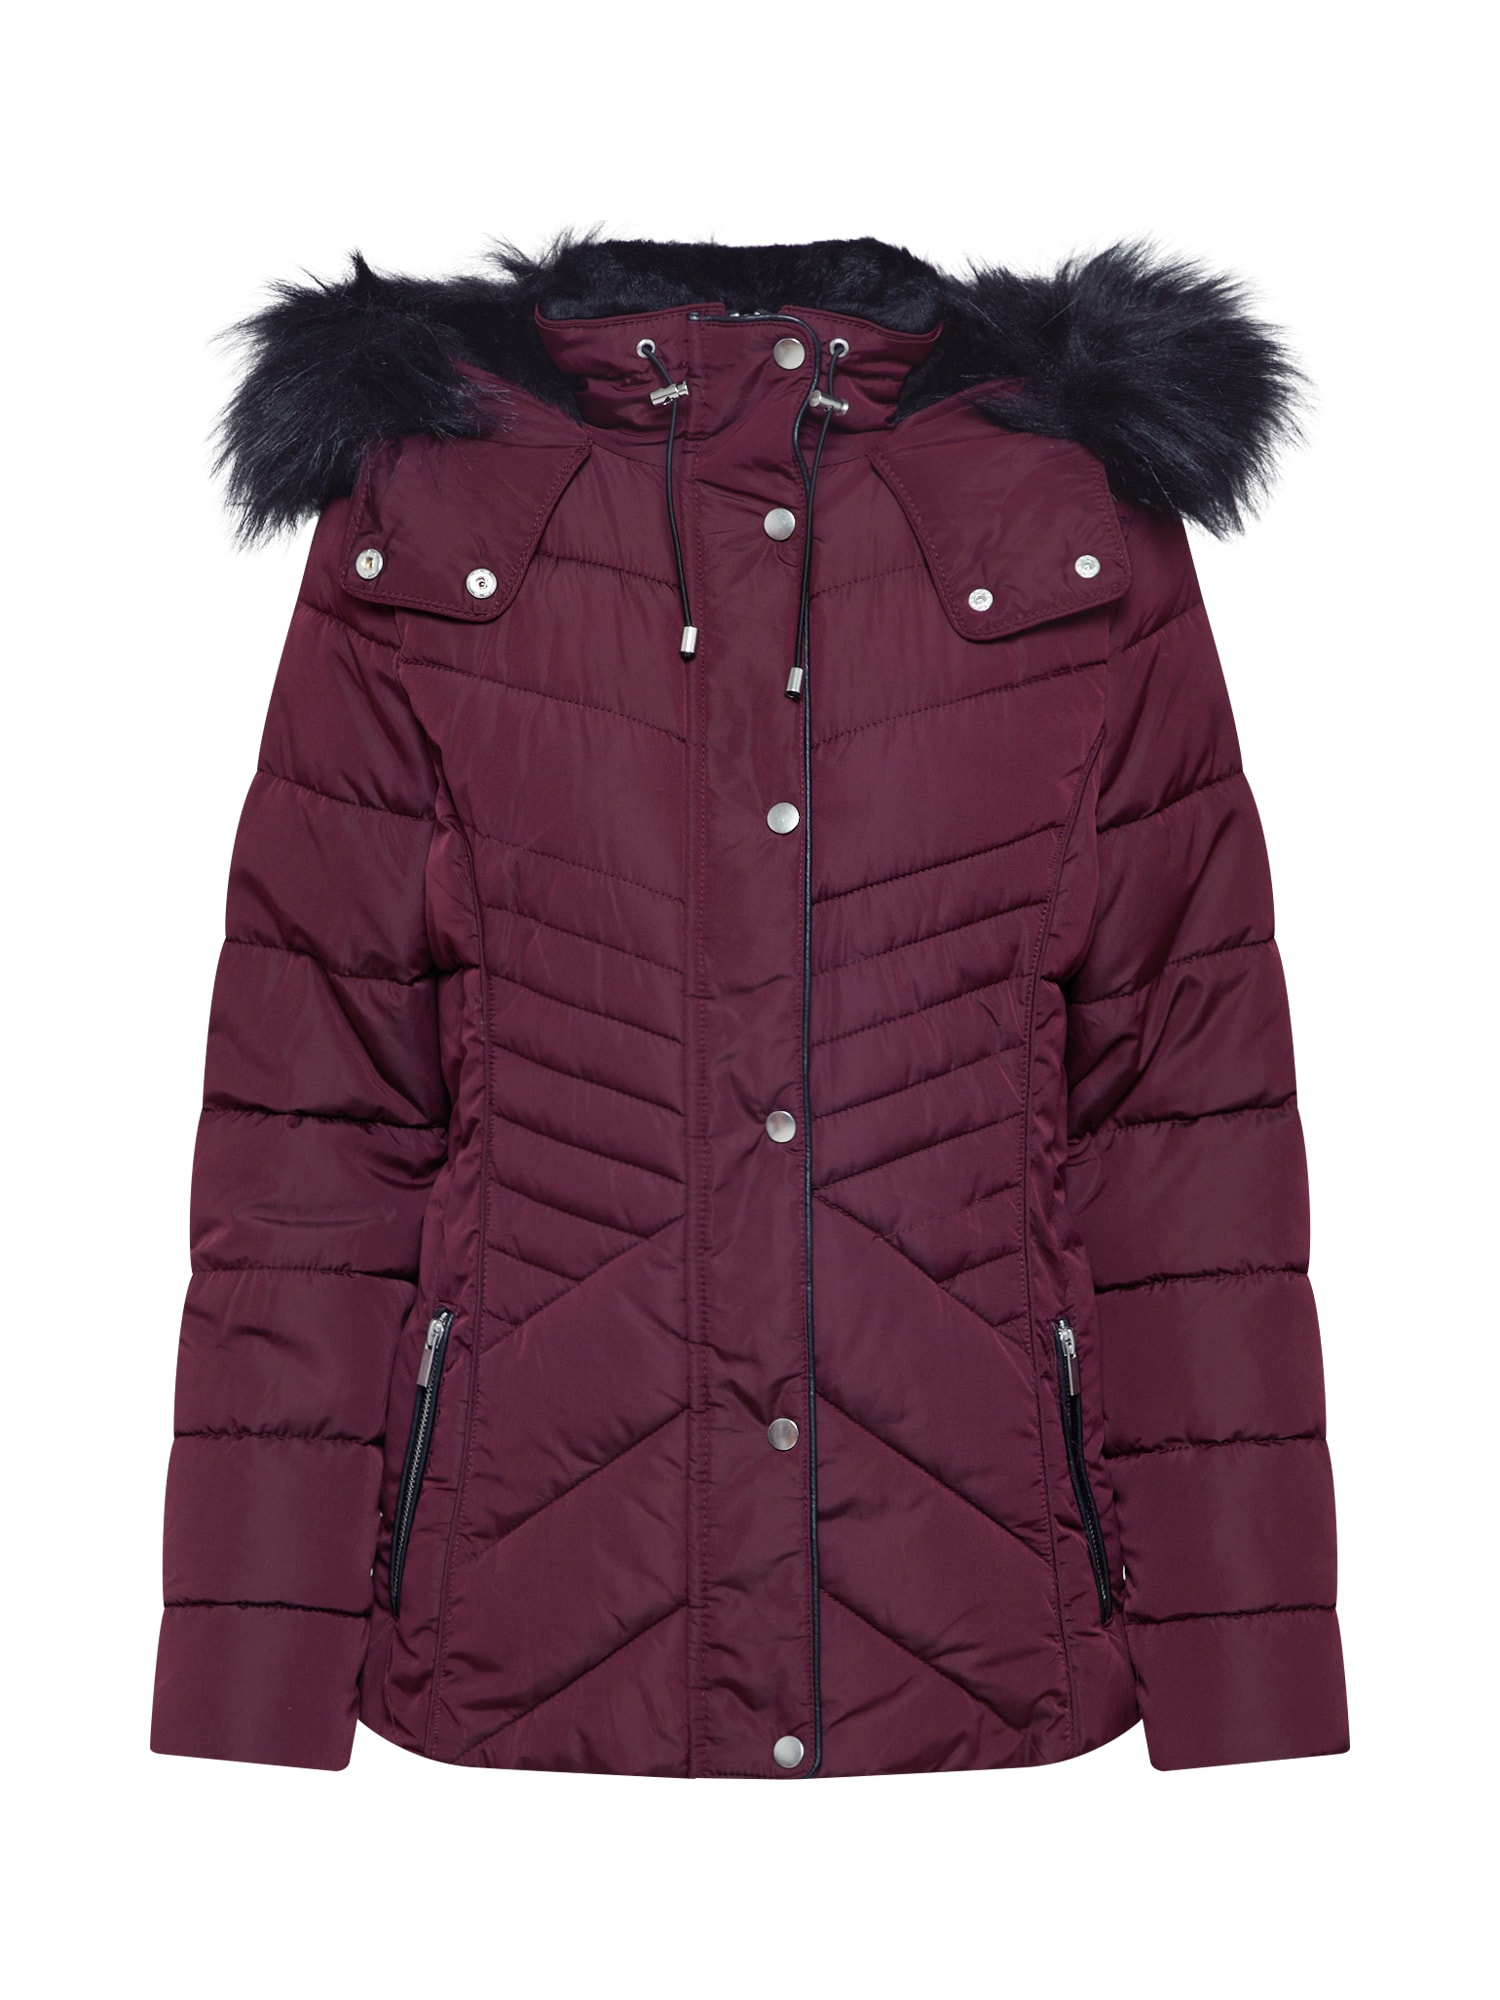 NEW LOOK Zimní bunda  burgundská červeň